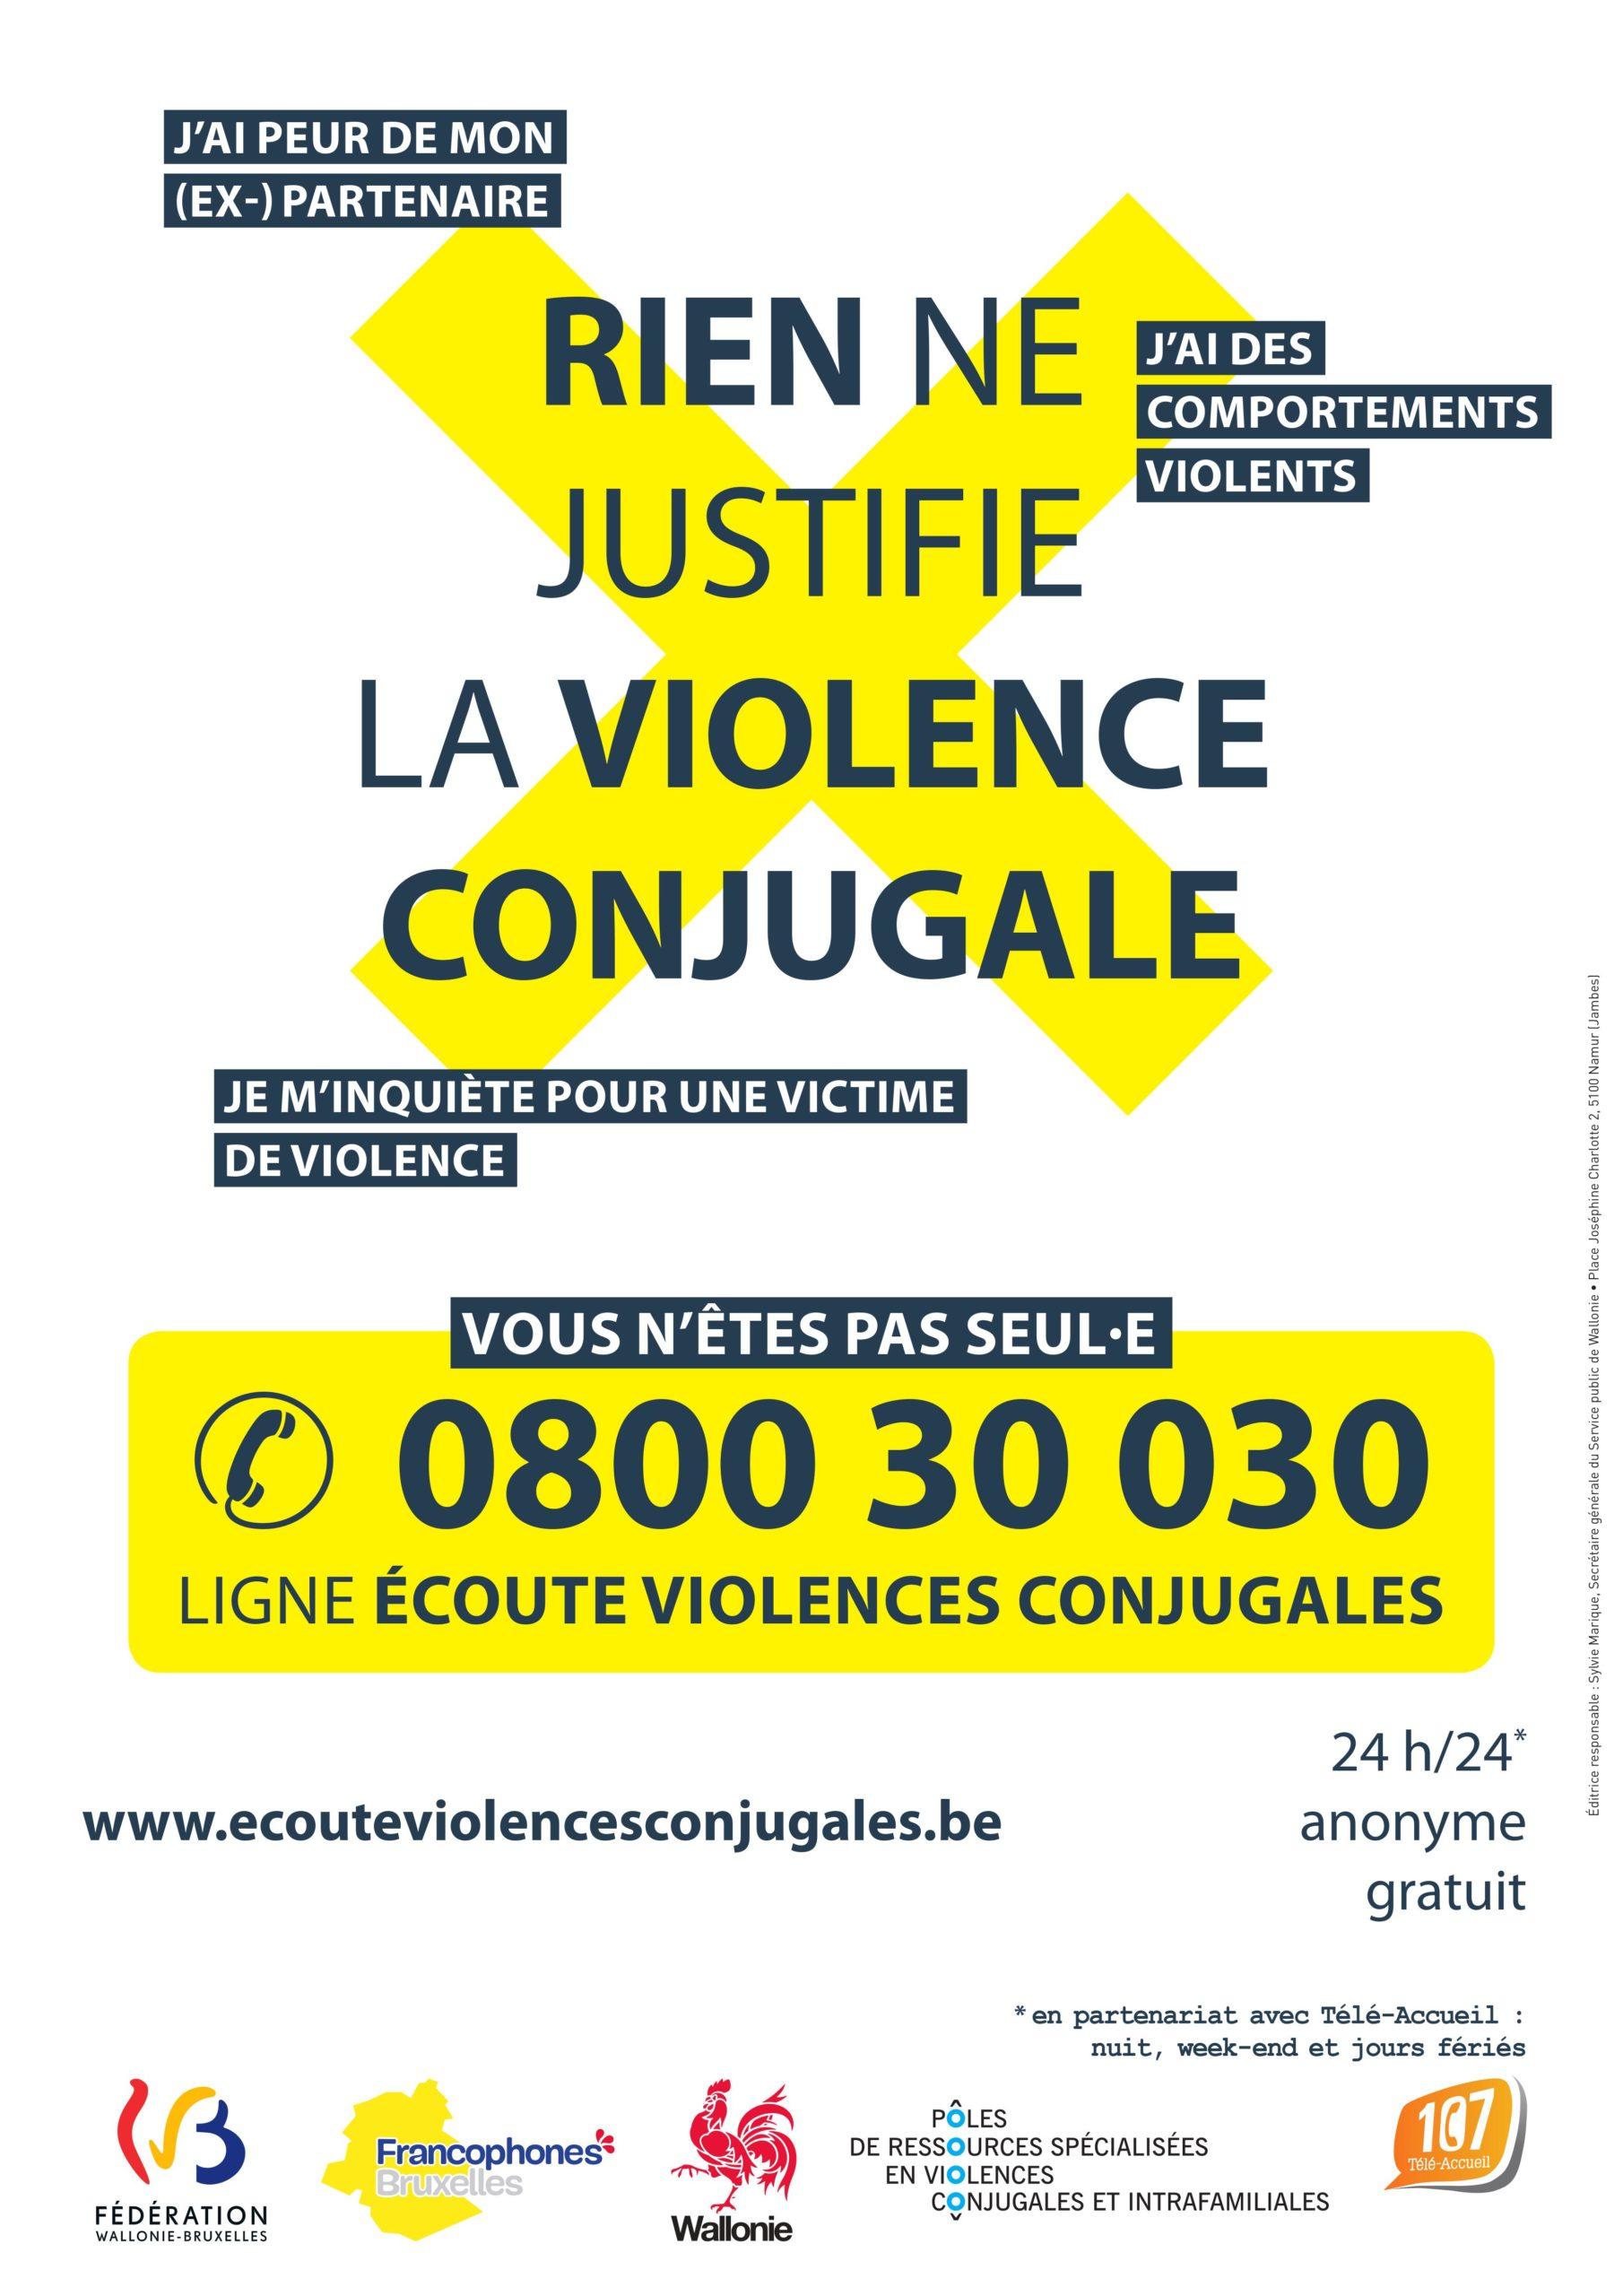 Rien ne justifie la violence - 0800 30 030 - www.ecouteviolencesconjugales.be